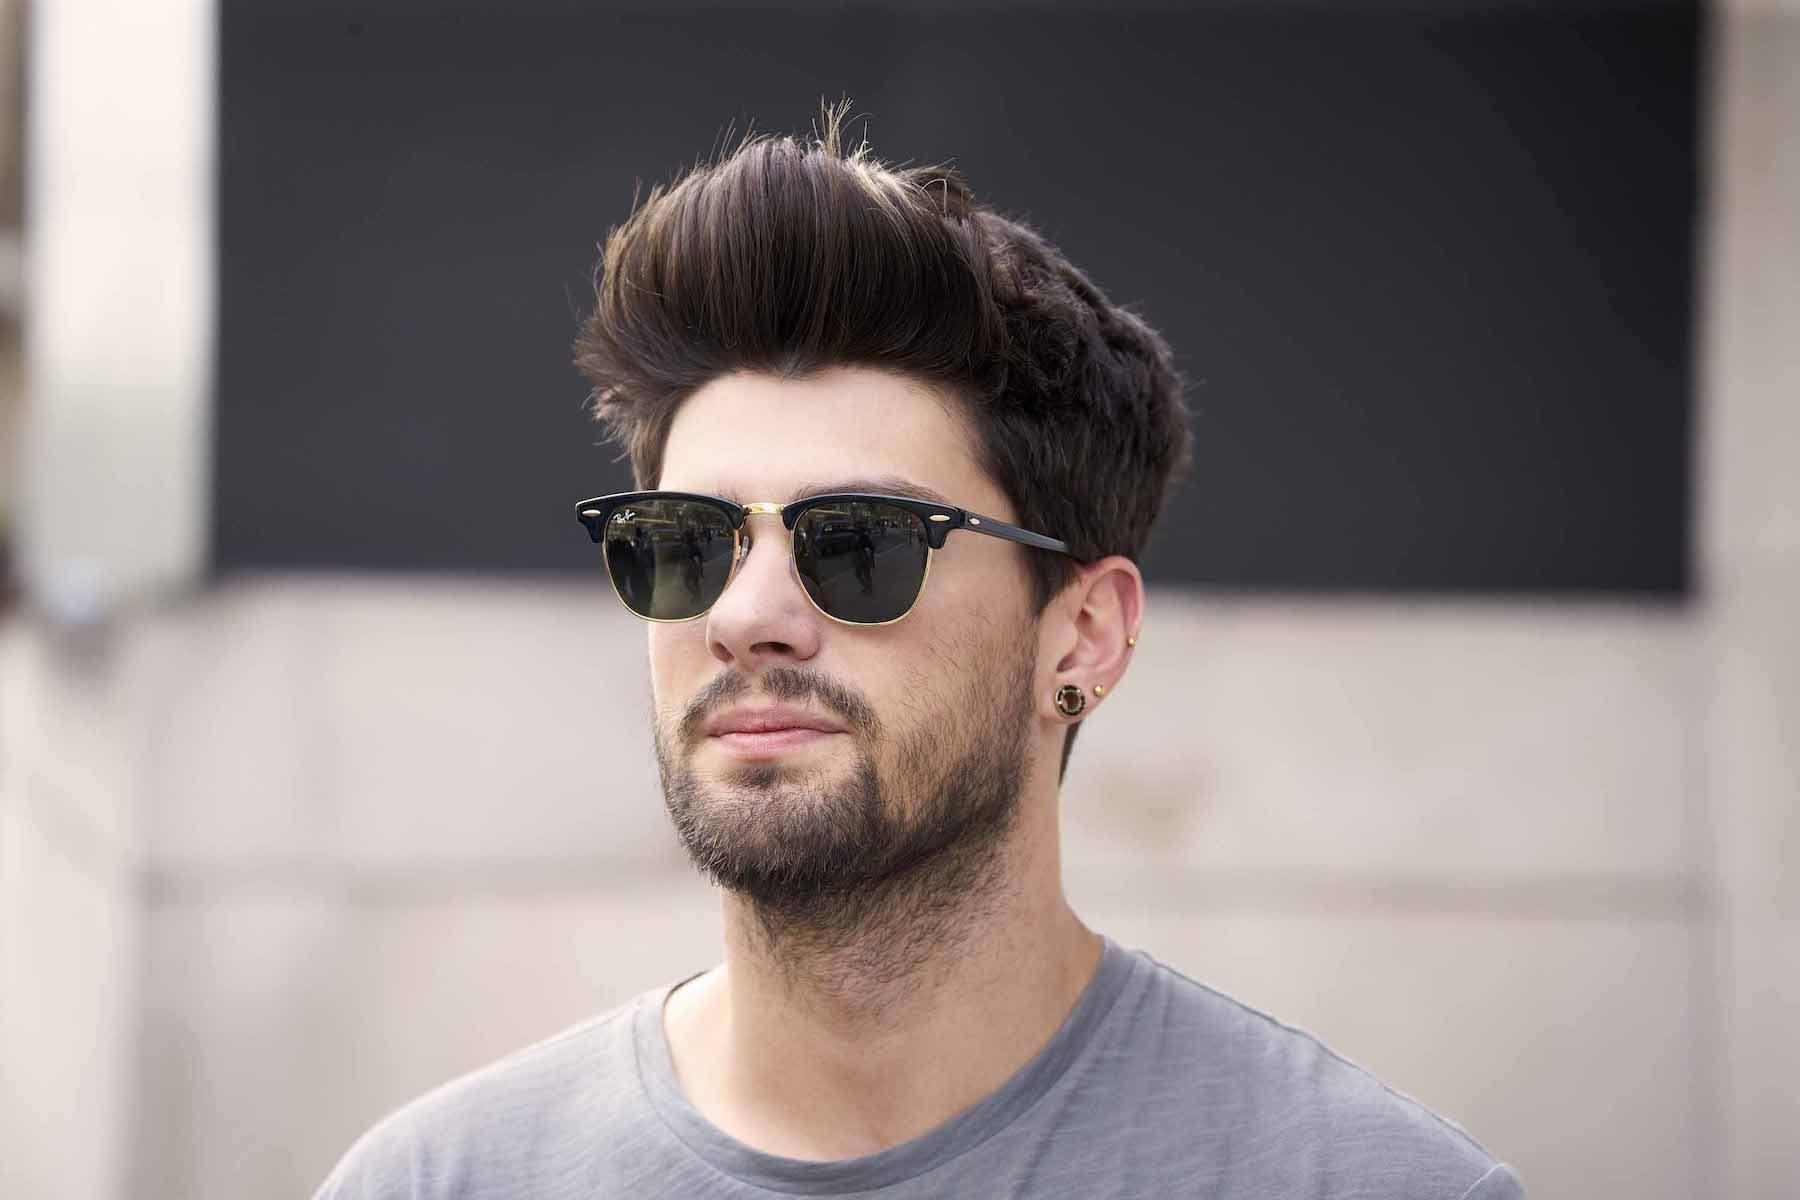 Pria kaukasia dengan model rambut pria wajah bulat bervolume 9d136d4e36